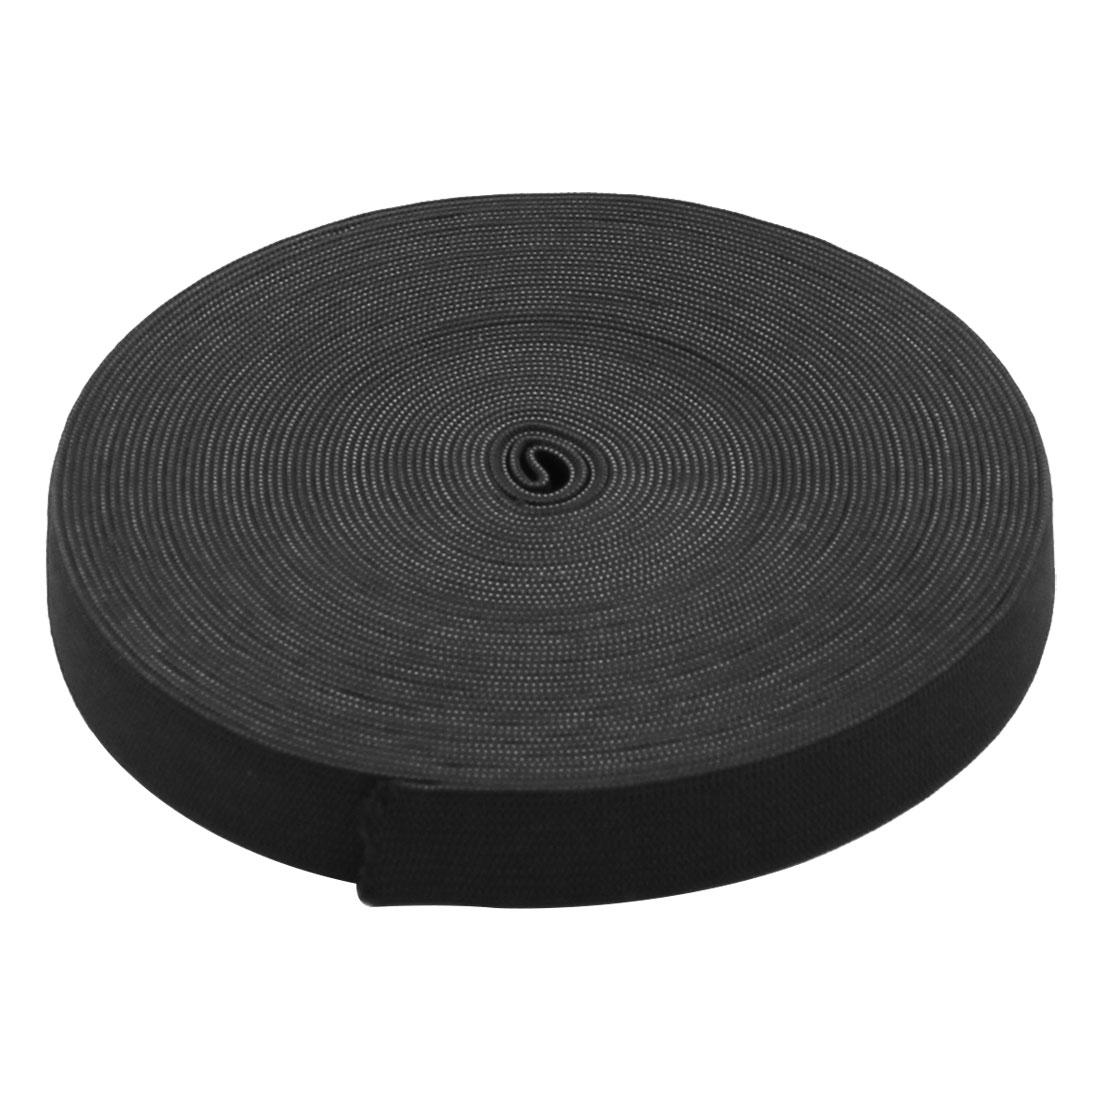 DIY Craft Elastic Spandex Lace Trim Tailor Sewing Applique Band 36ft Long Black